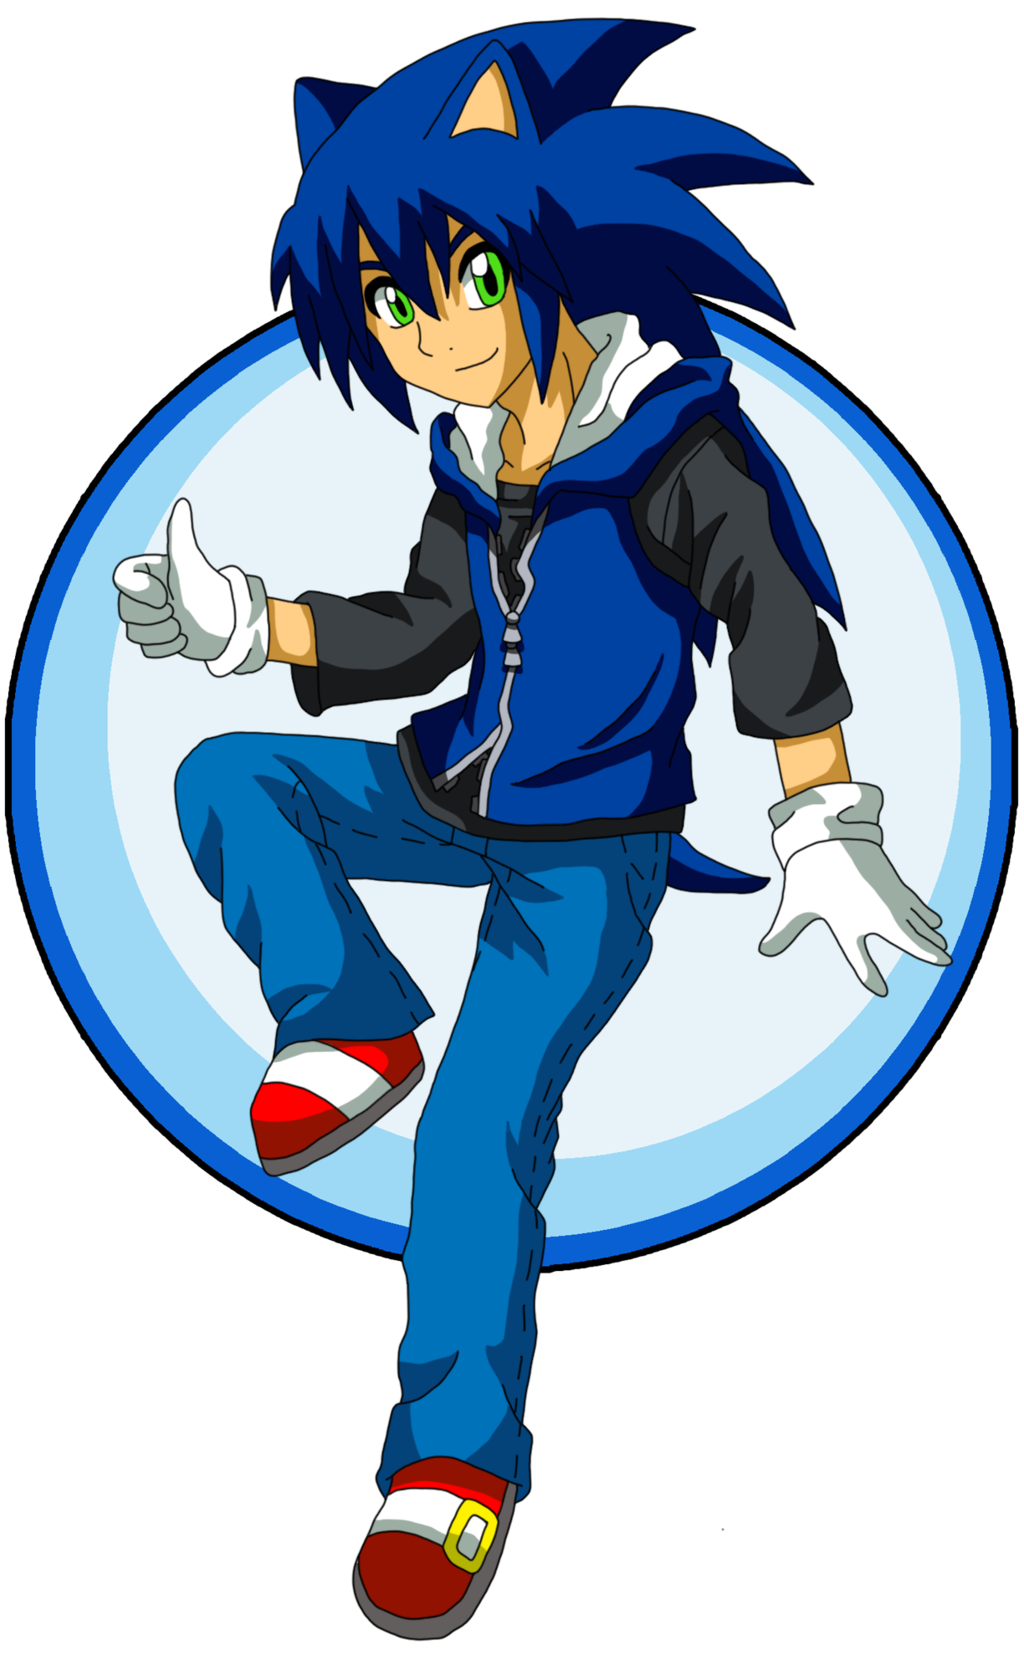 Sonic Anime Google Search Pokemon Personajes Personajes Personajes De Videojuegos